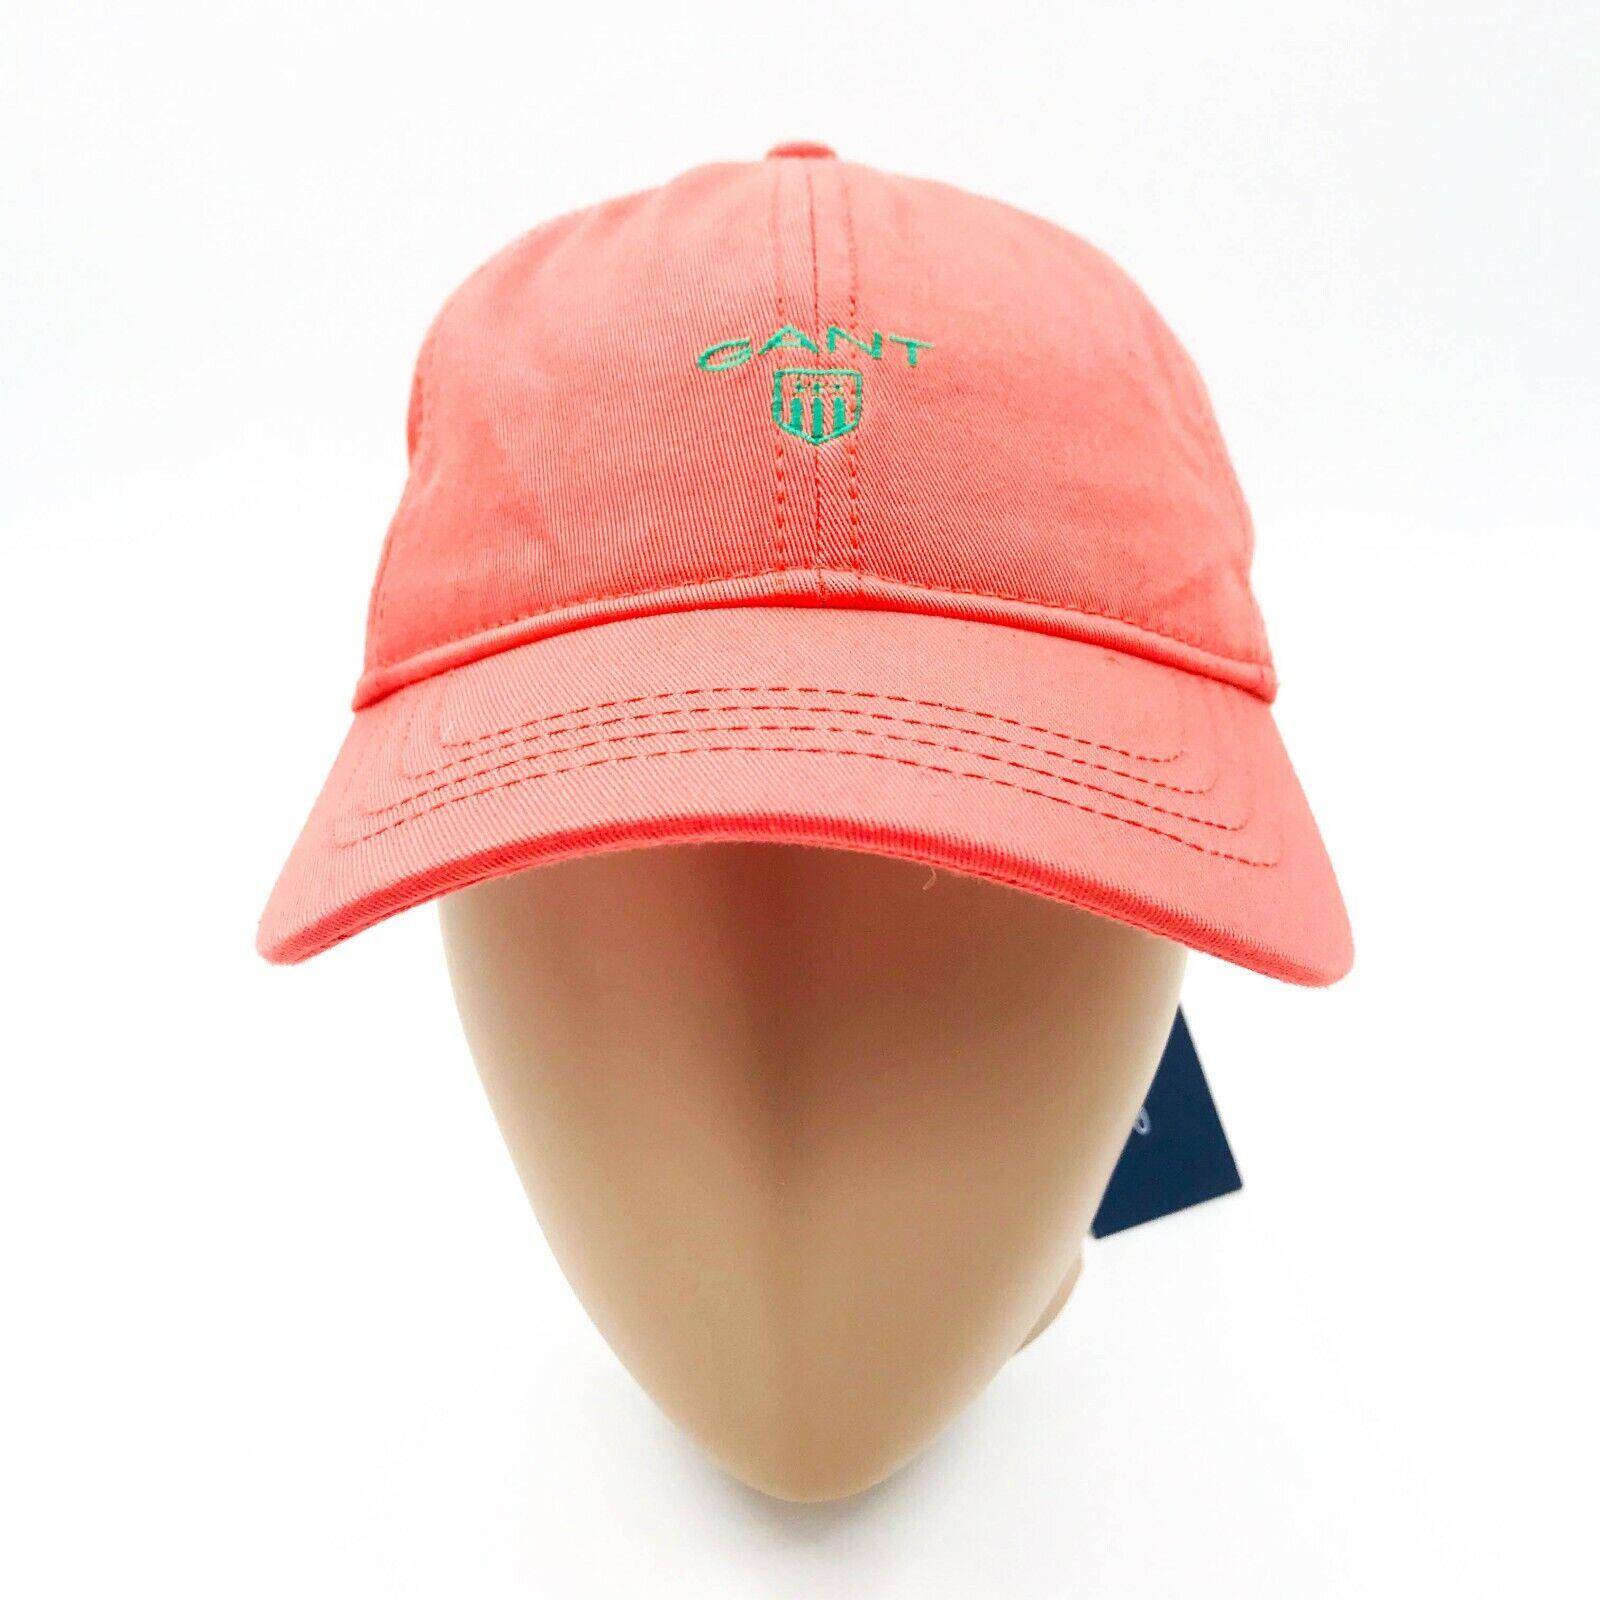 GANT Orange Rot Kontrast Twill Baseball Kappe Hut Einheitsgröße